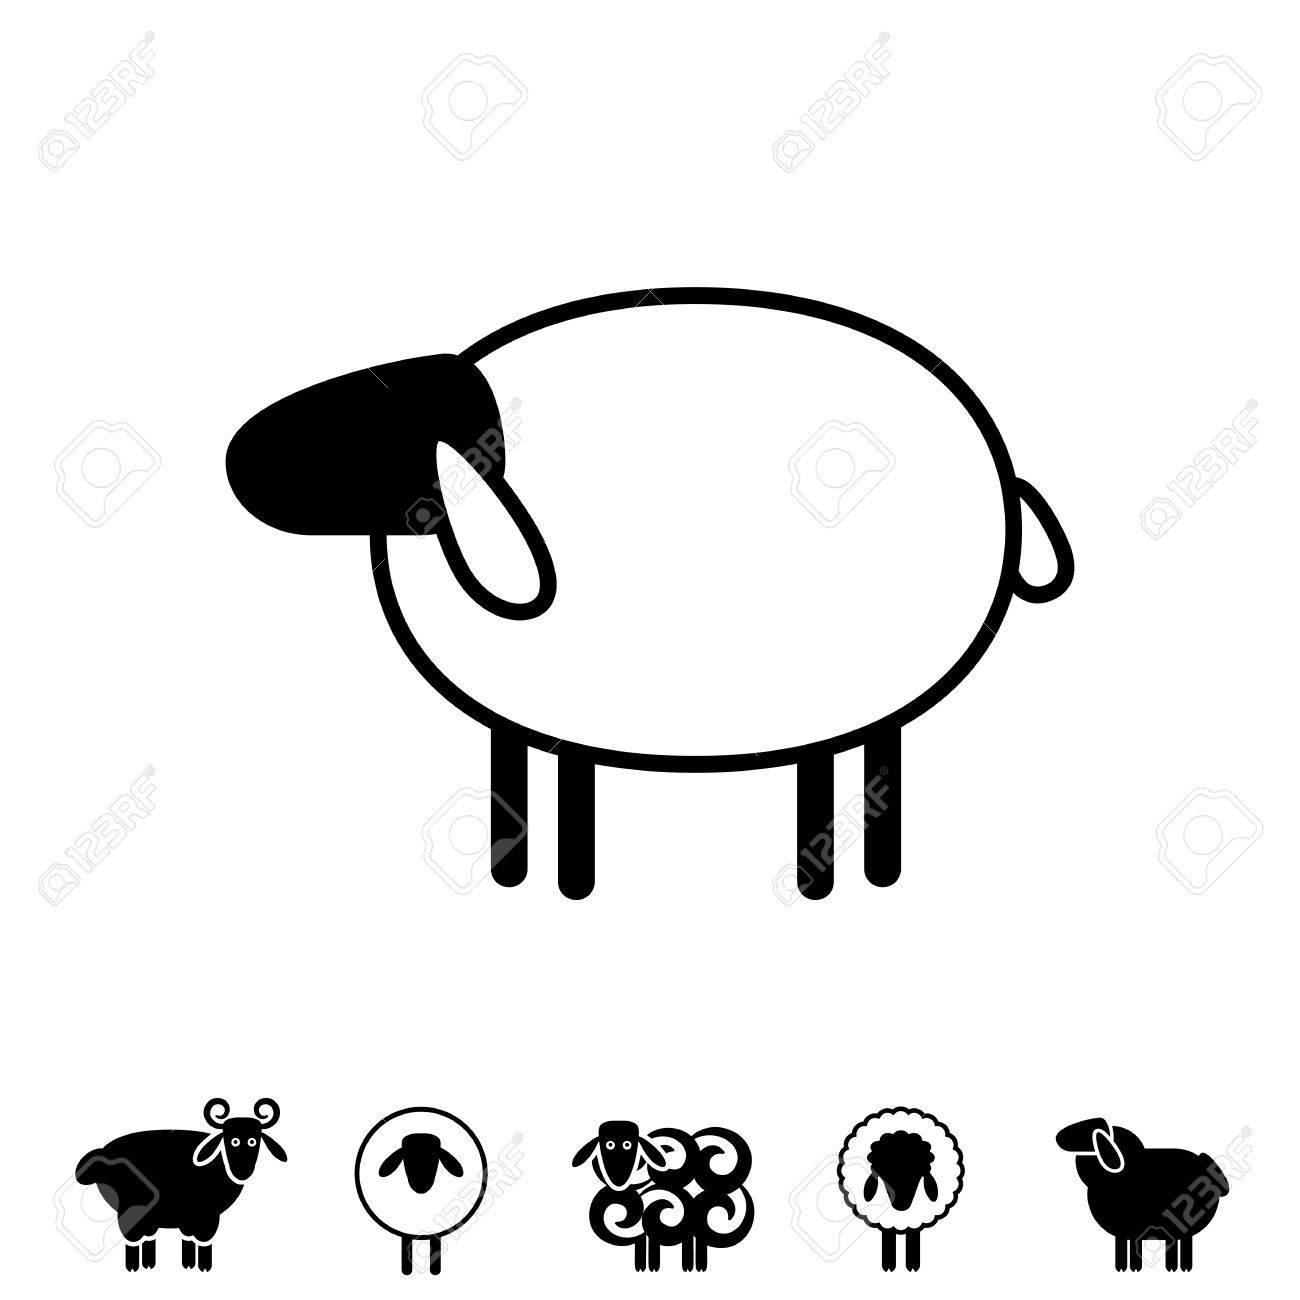 Colorful Lamb Template Component - Resume Ideas - namanasa.com